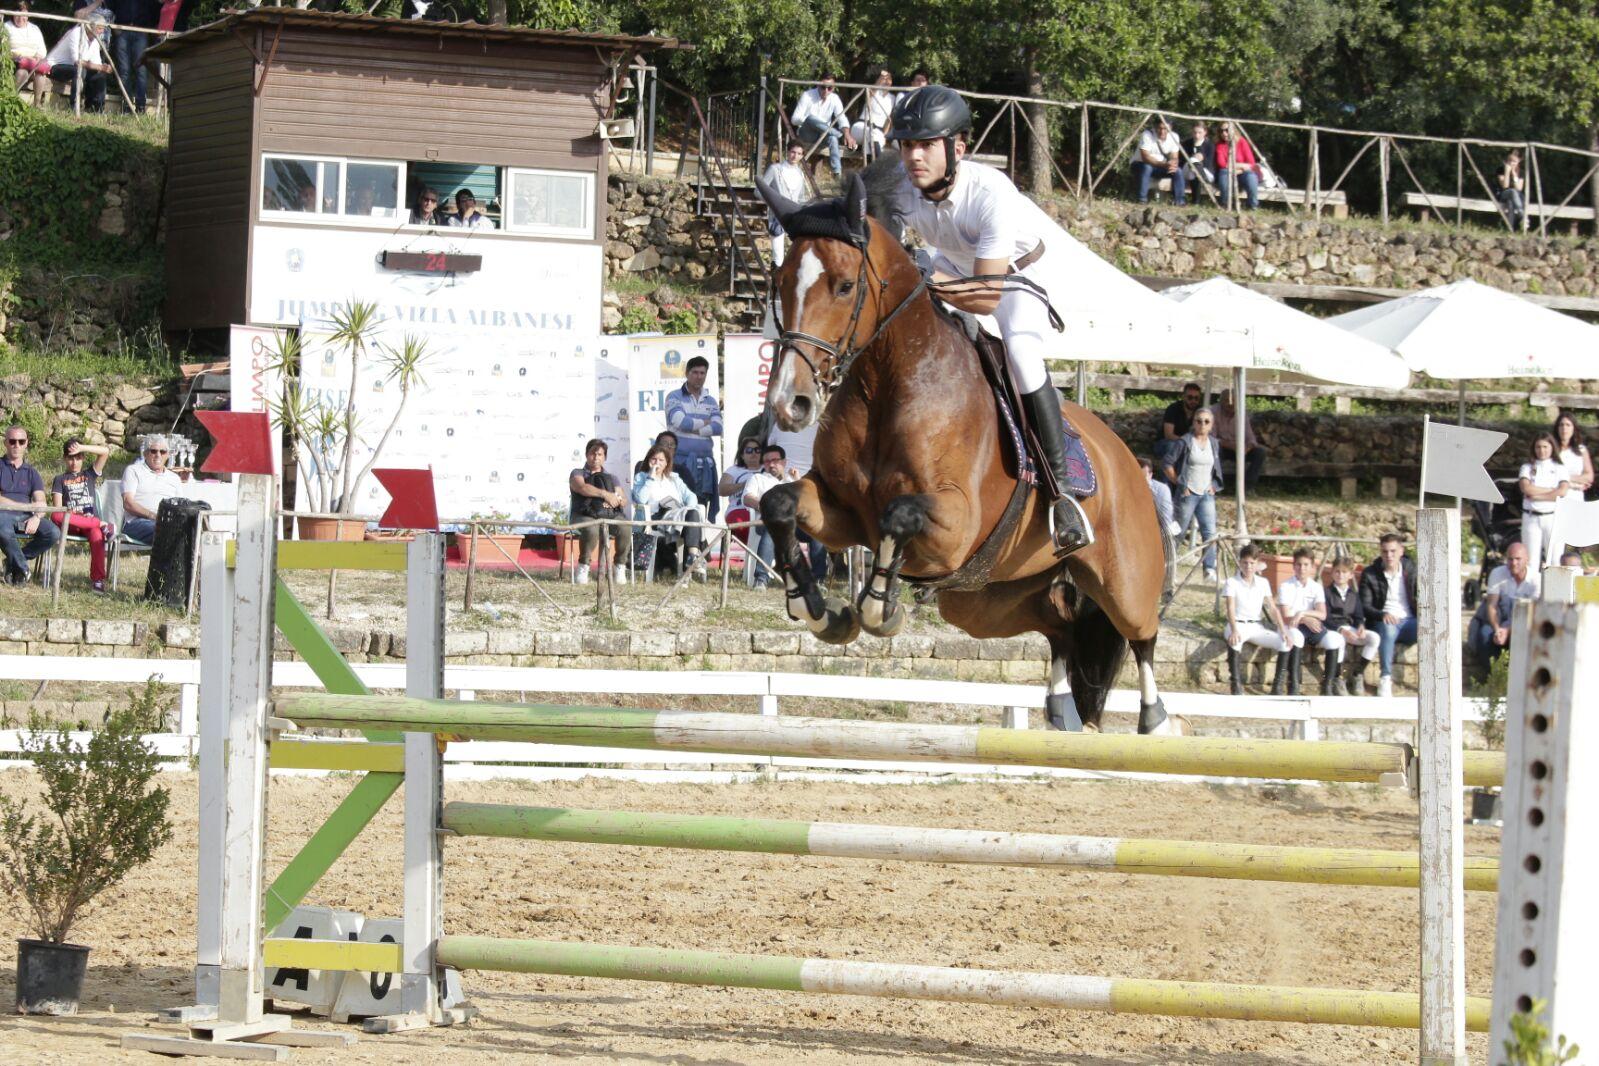 Testaverde_Doornroosje _horses foto (2)